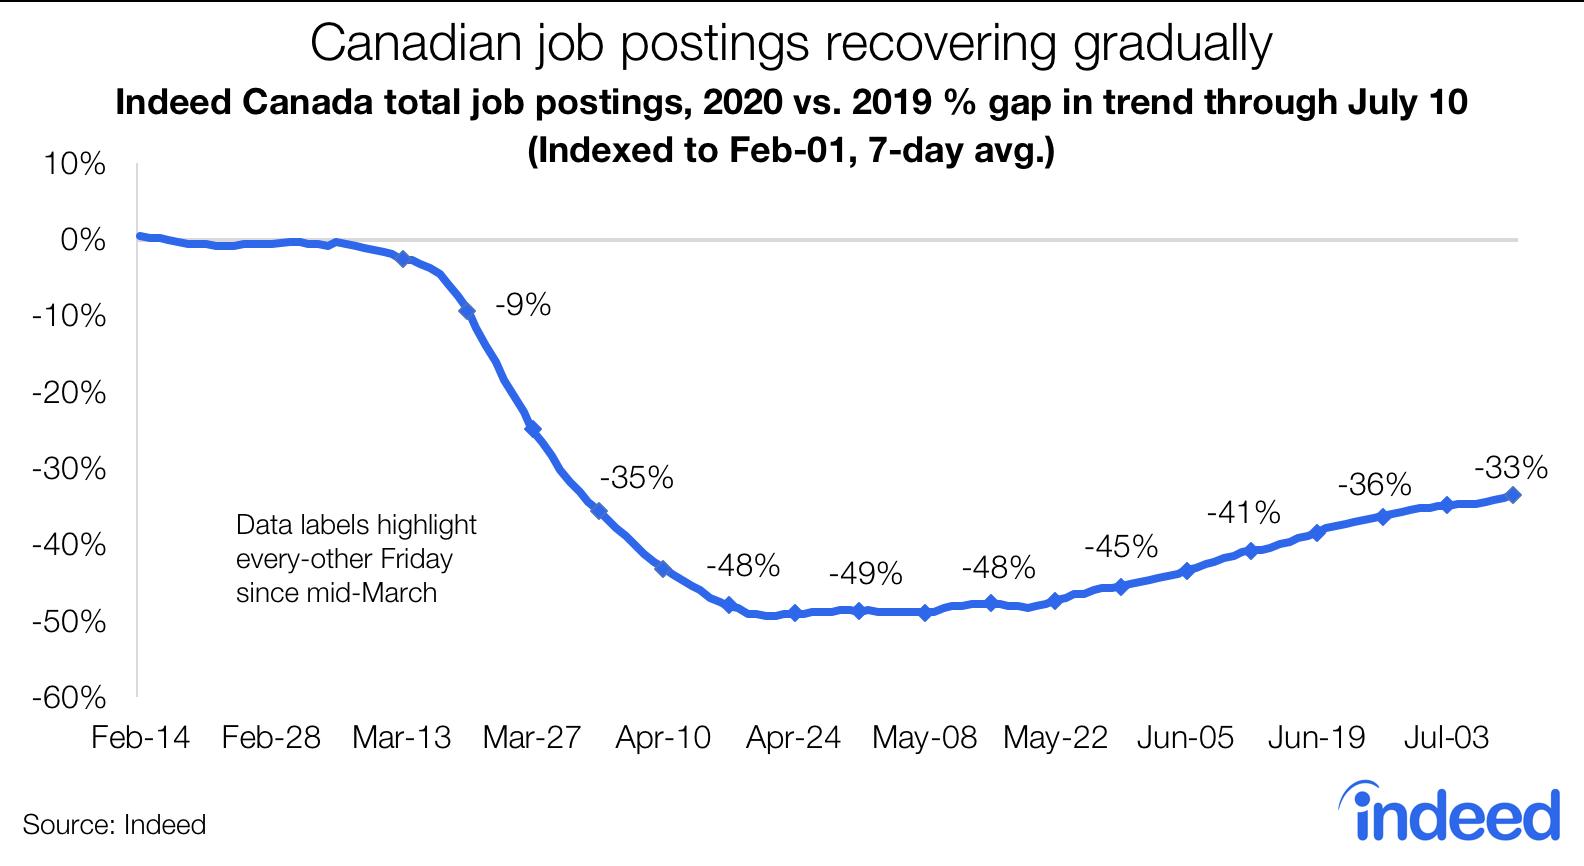 Canadian job postings recovering gradually